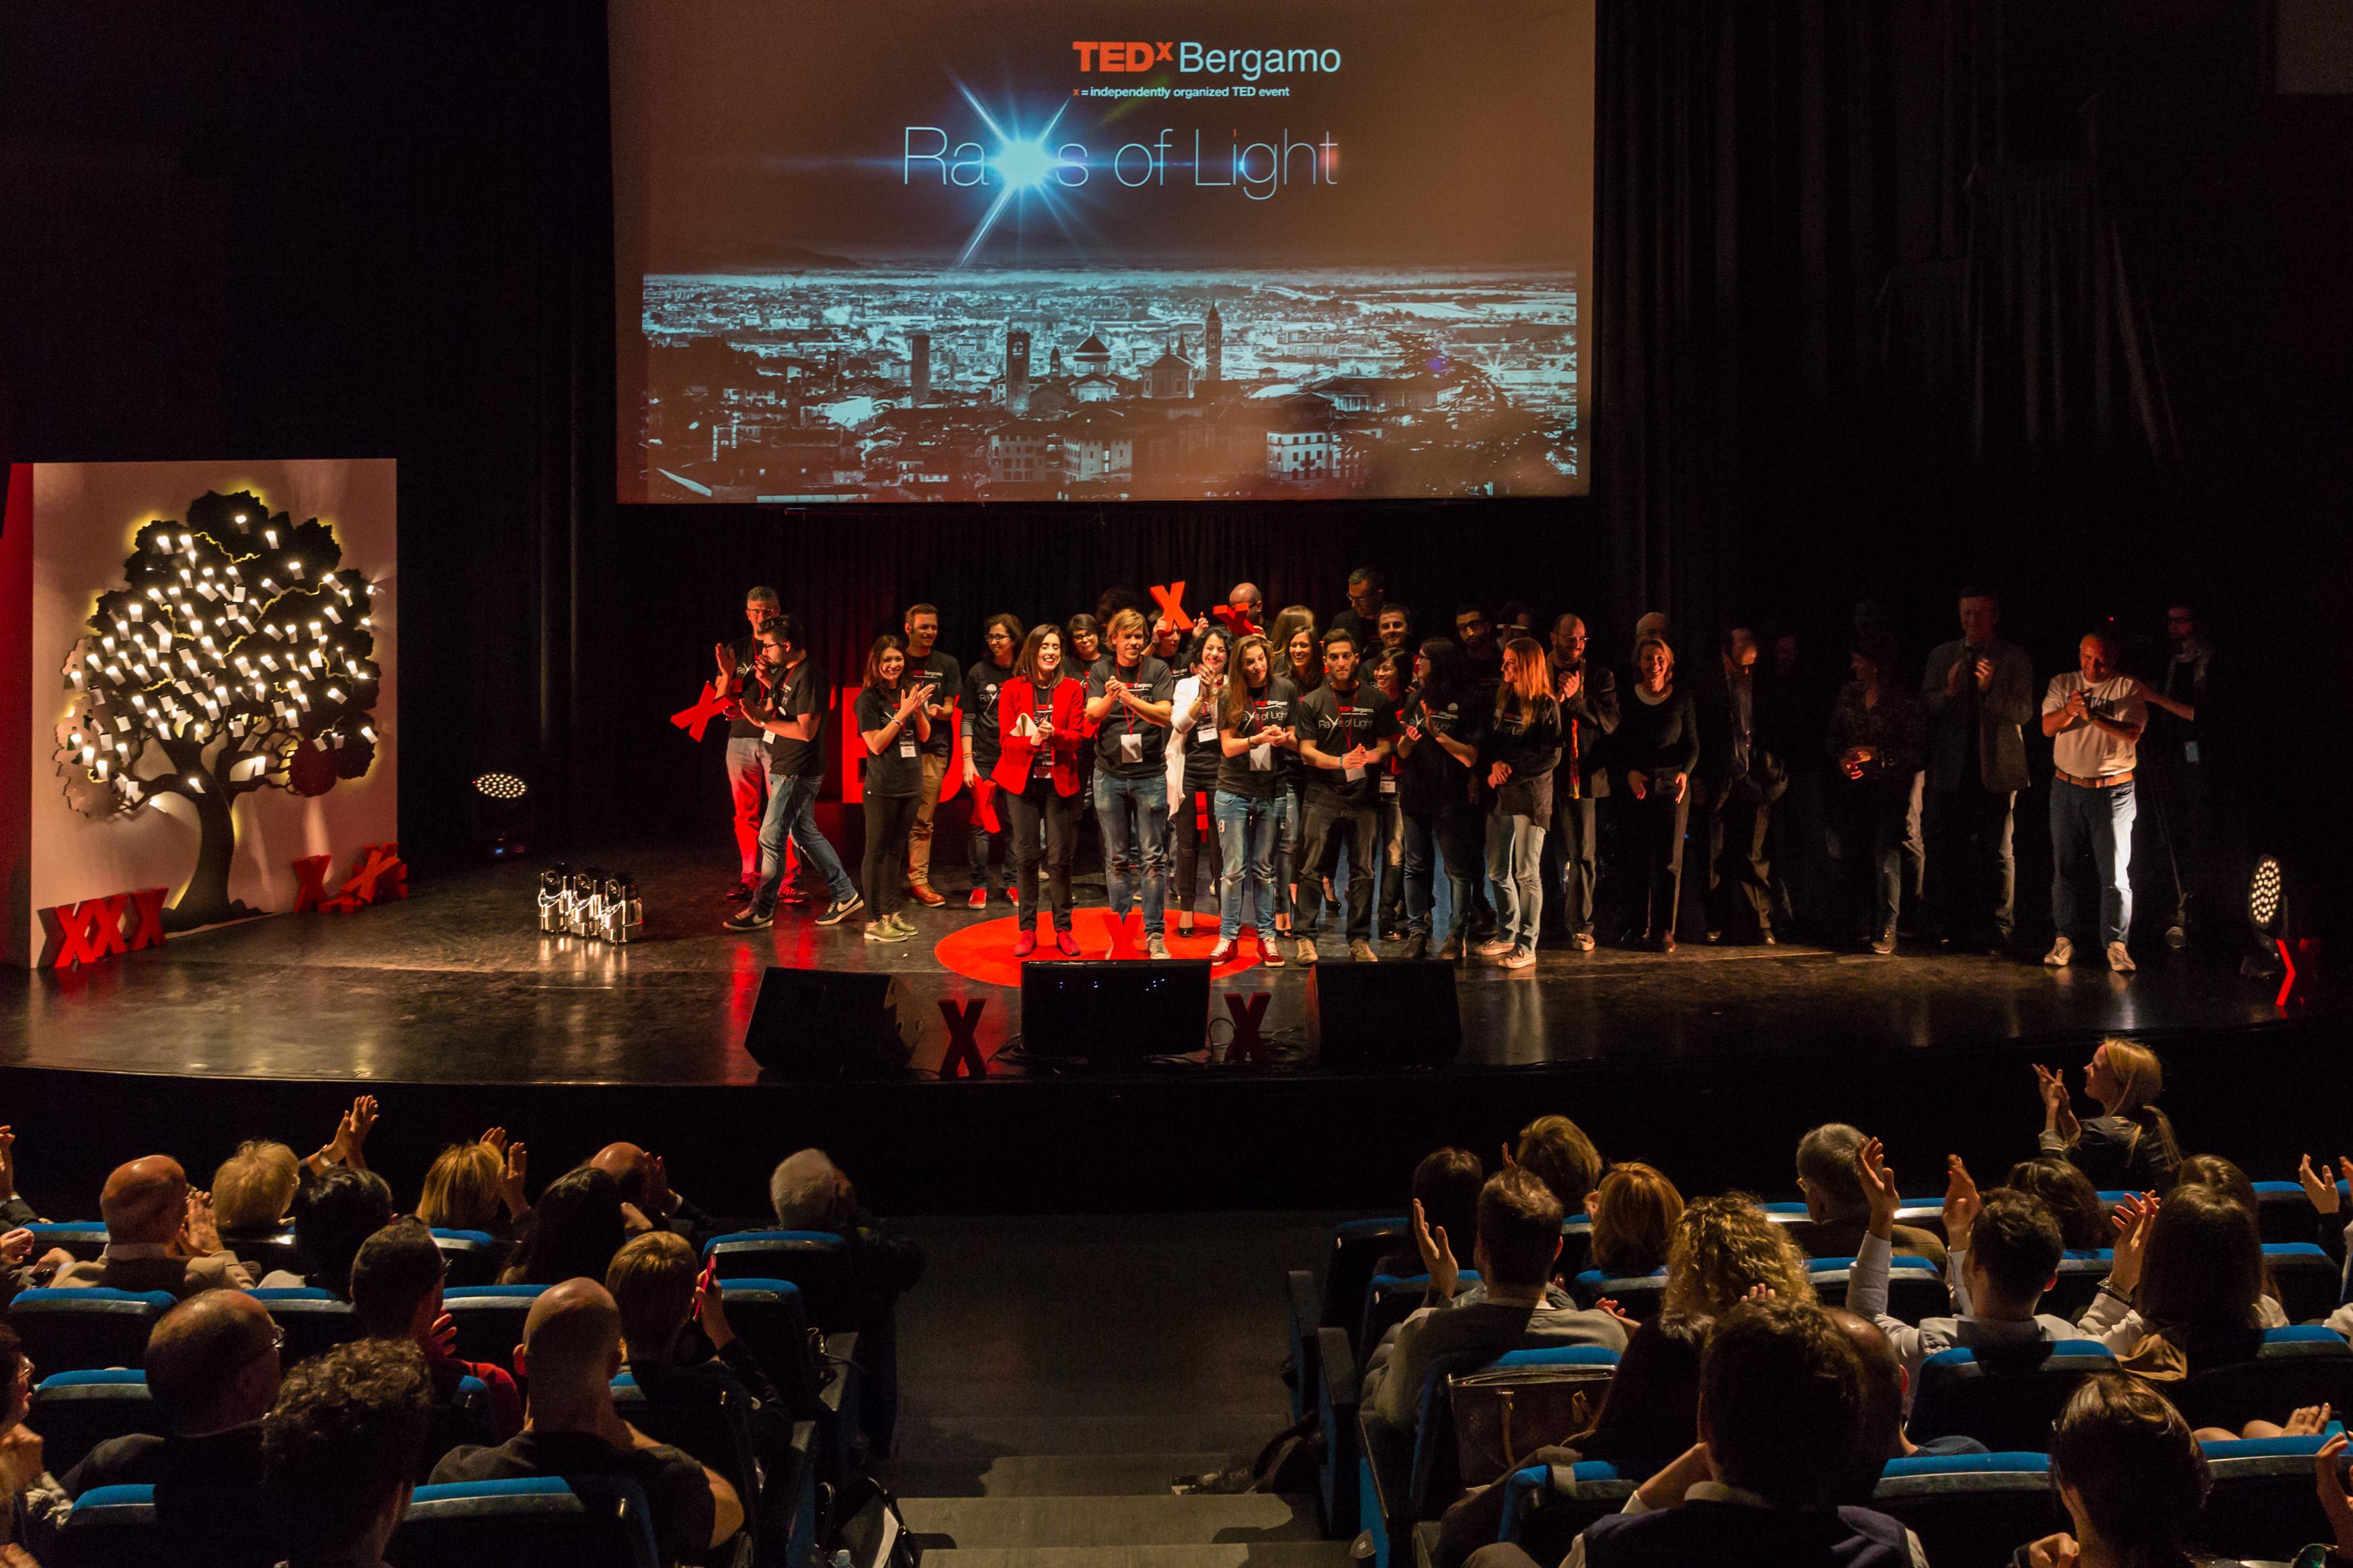 TEDx Bergamo